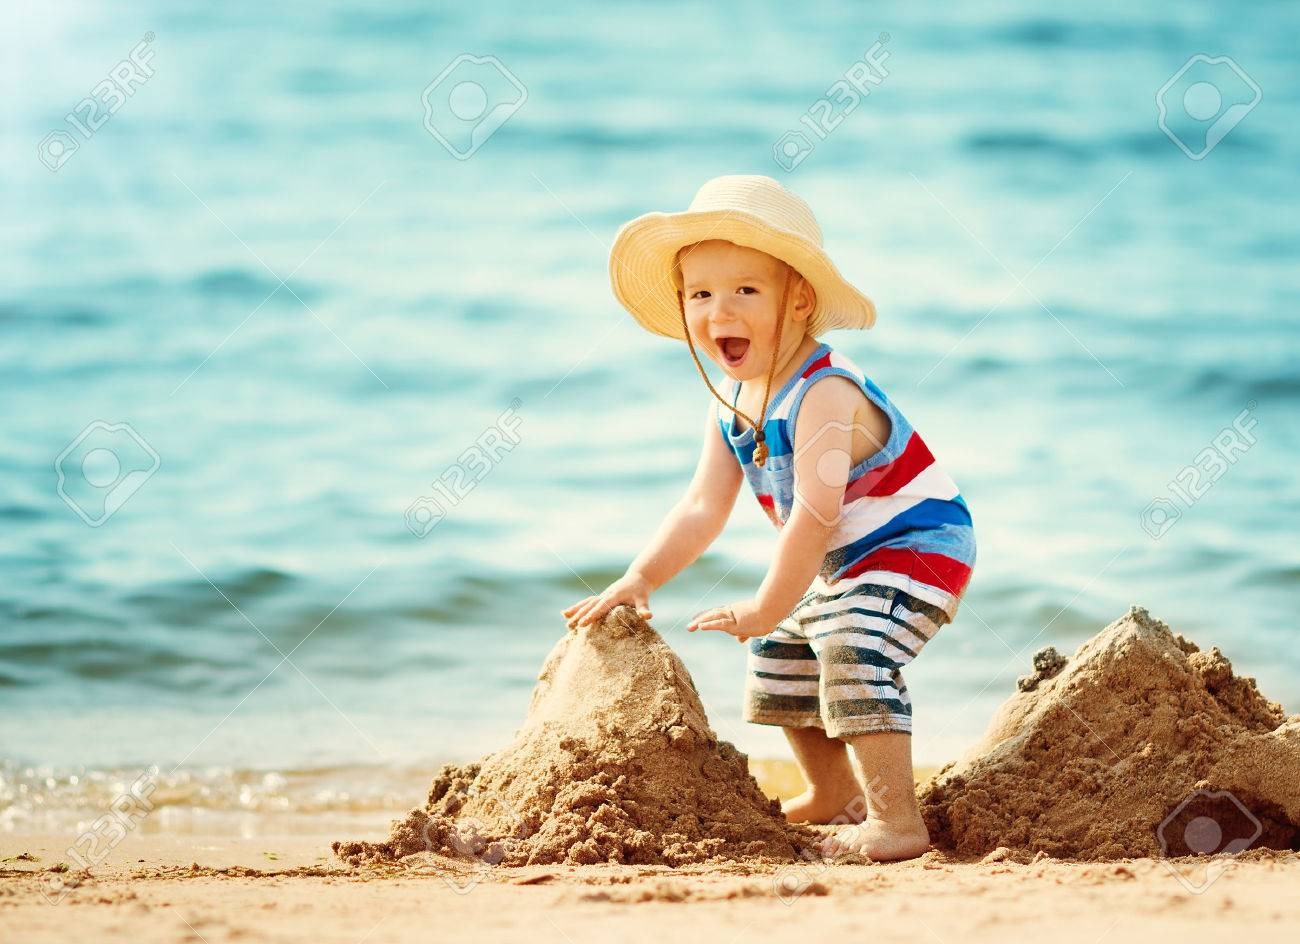 little boy walking at the beach in straw hat - 76196908